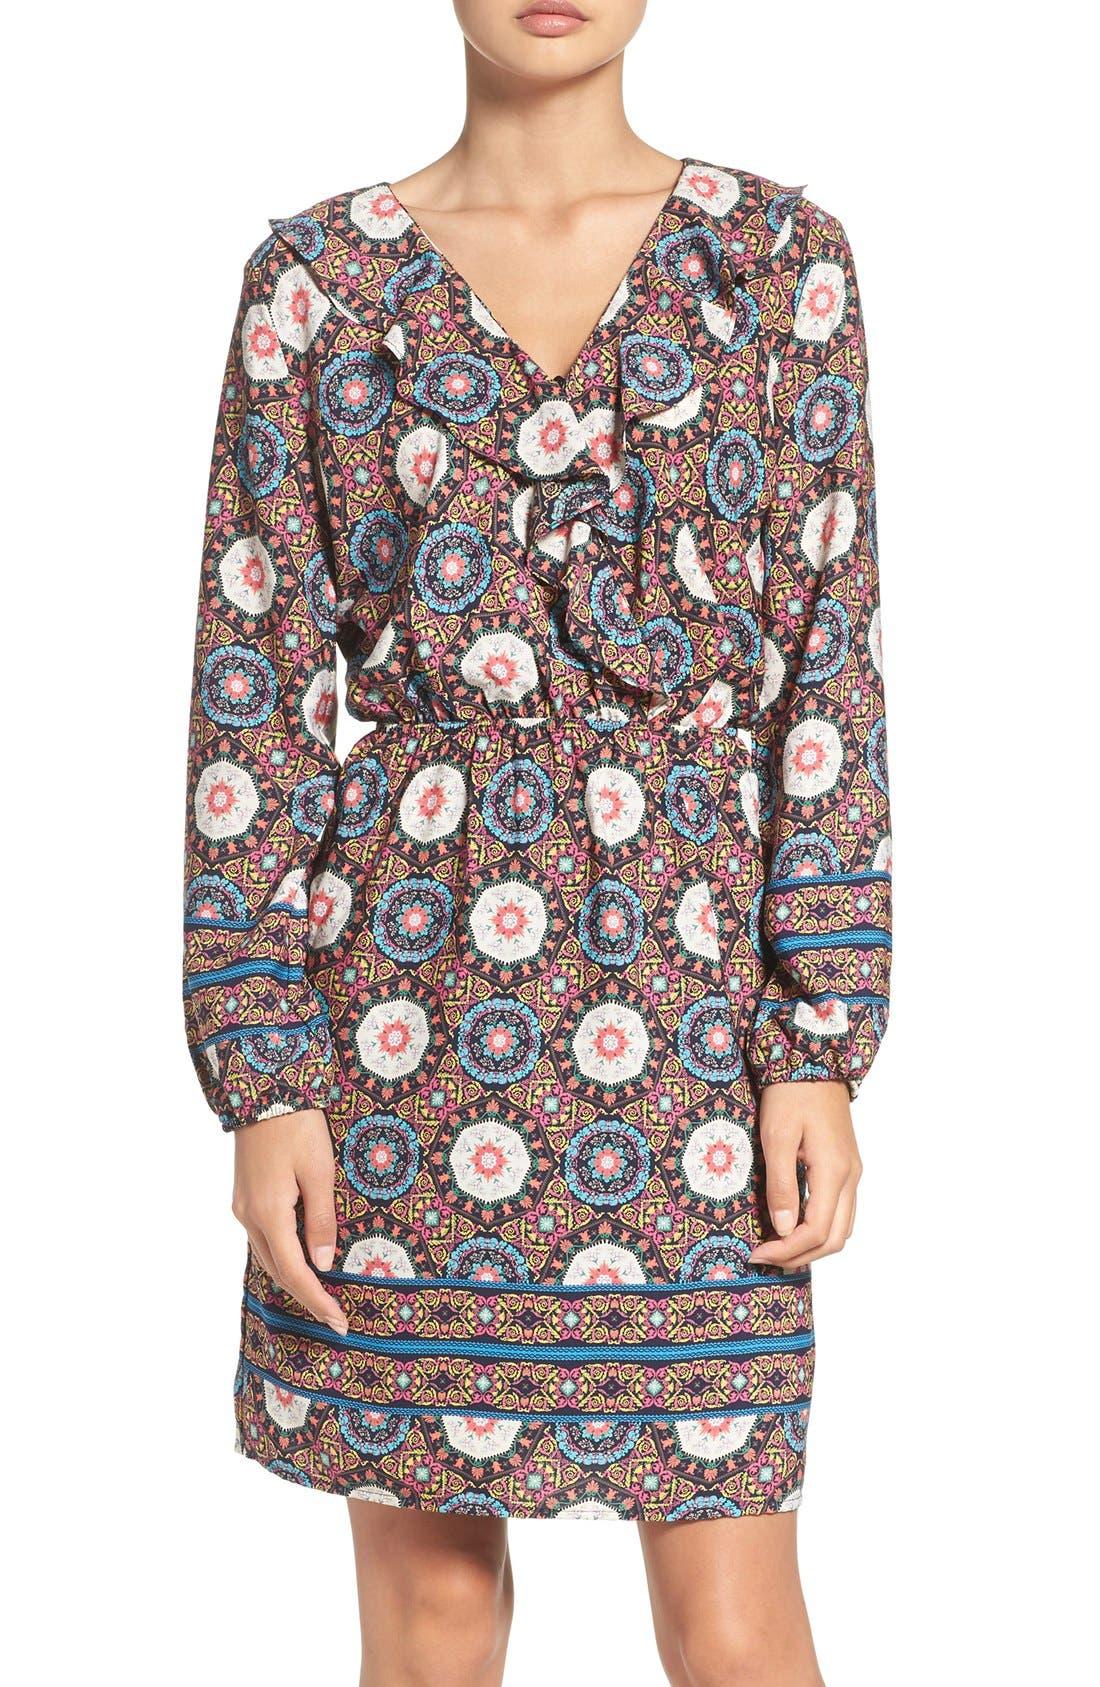 'Nadia' Ruffle Blouson Dress,                         Main,                         color, Nadia Blue